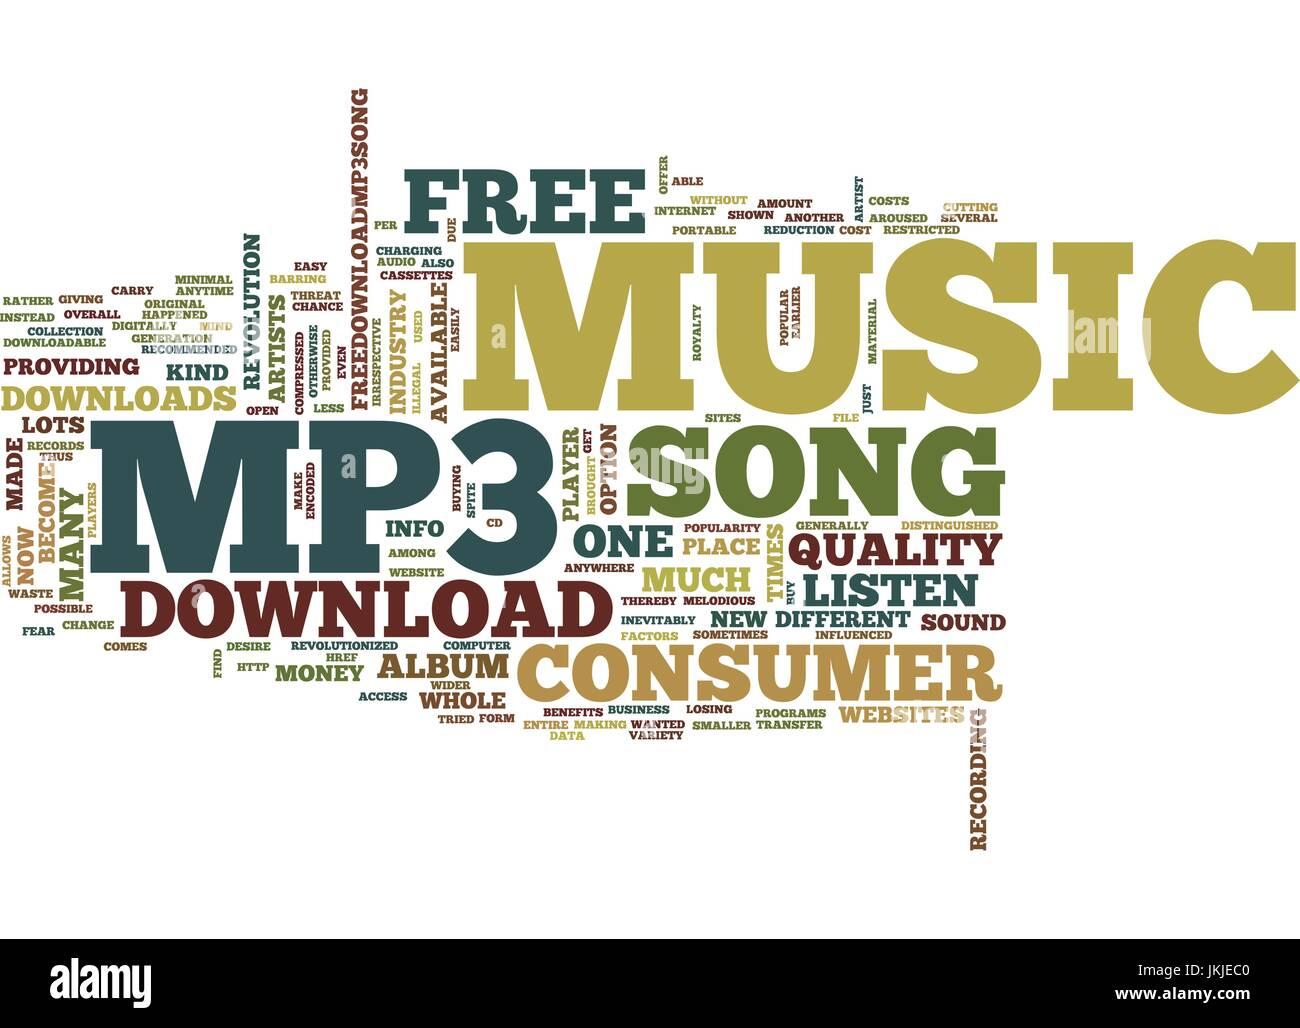 Download 68 Koleksi Background Song Download Gratis Terbaik